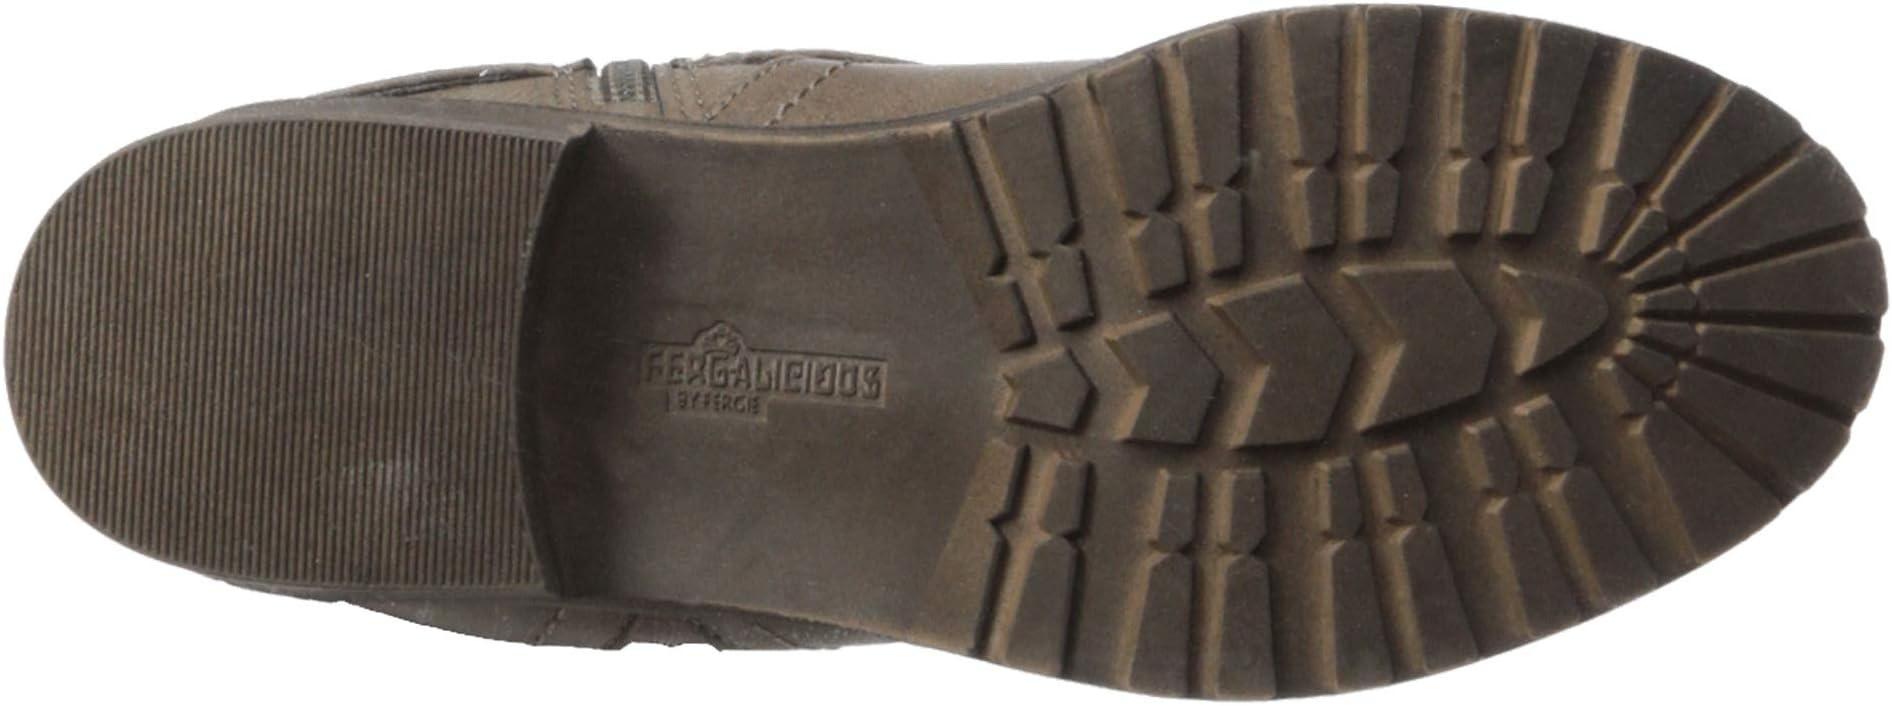 Fergalicious Recall | Women's shoes | 2020 Newest